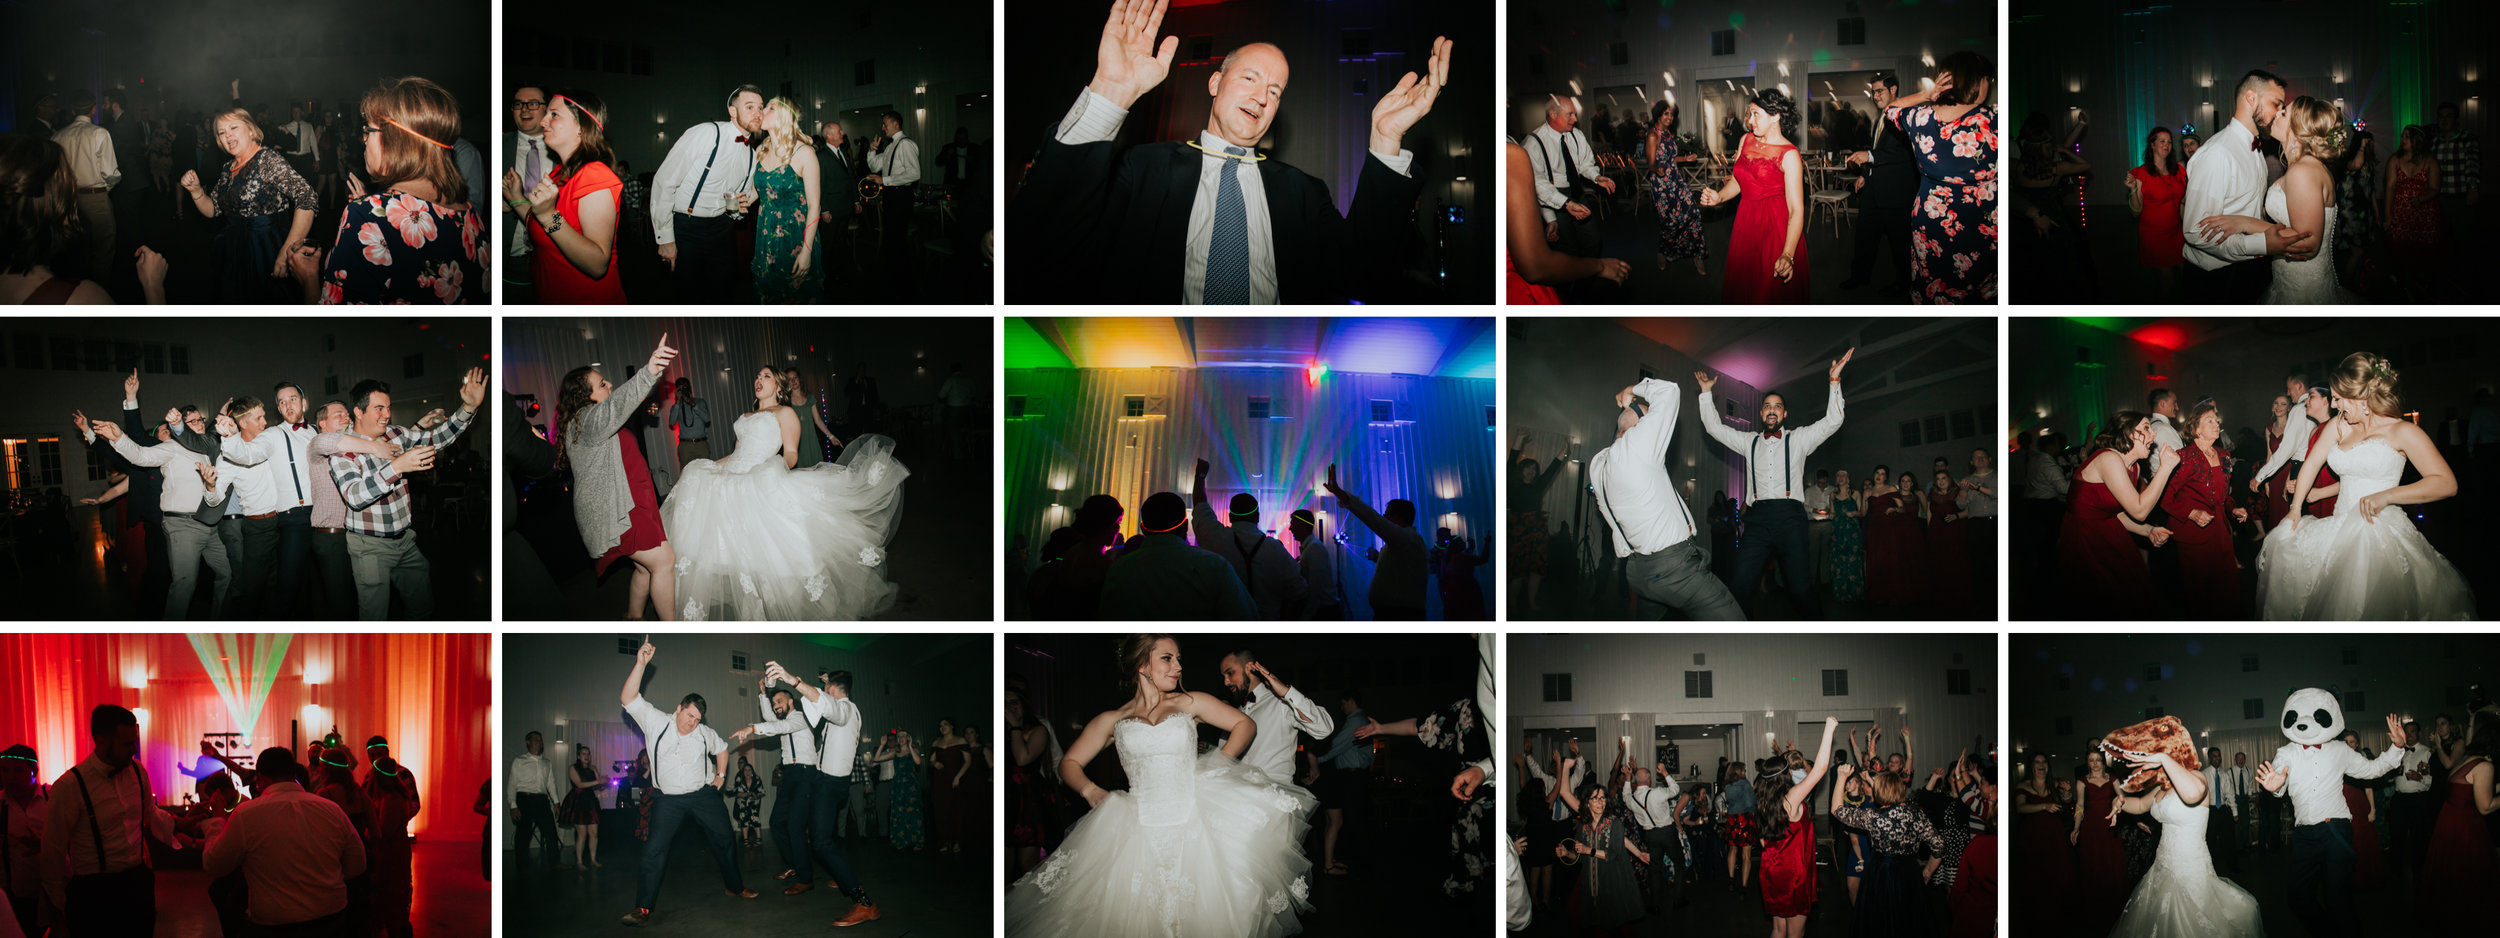 The Farmhouse Dancing Reception-1.jpg